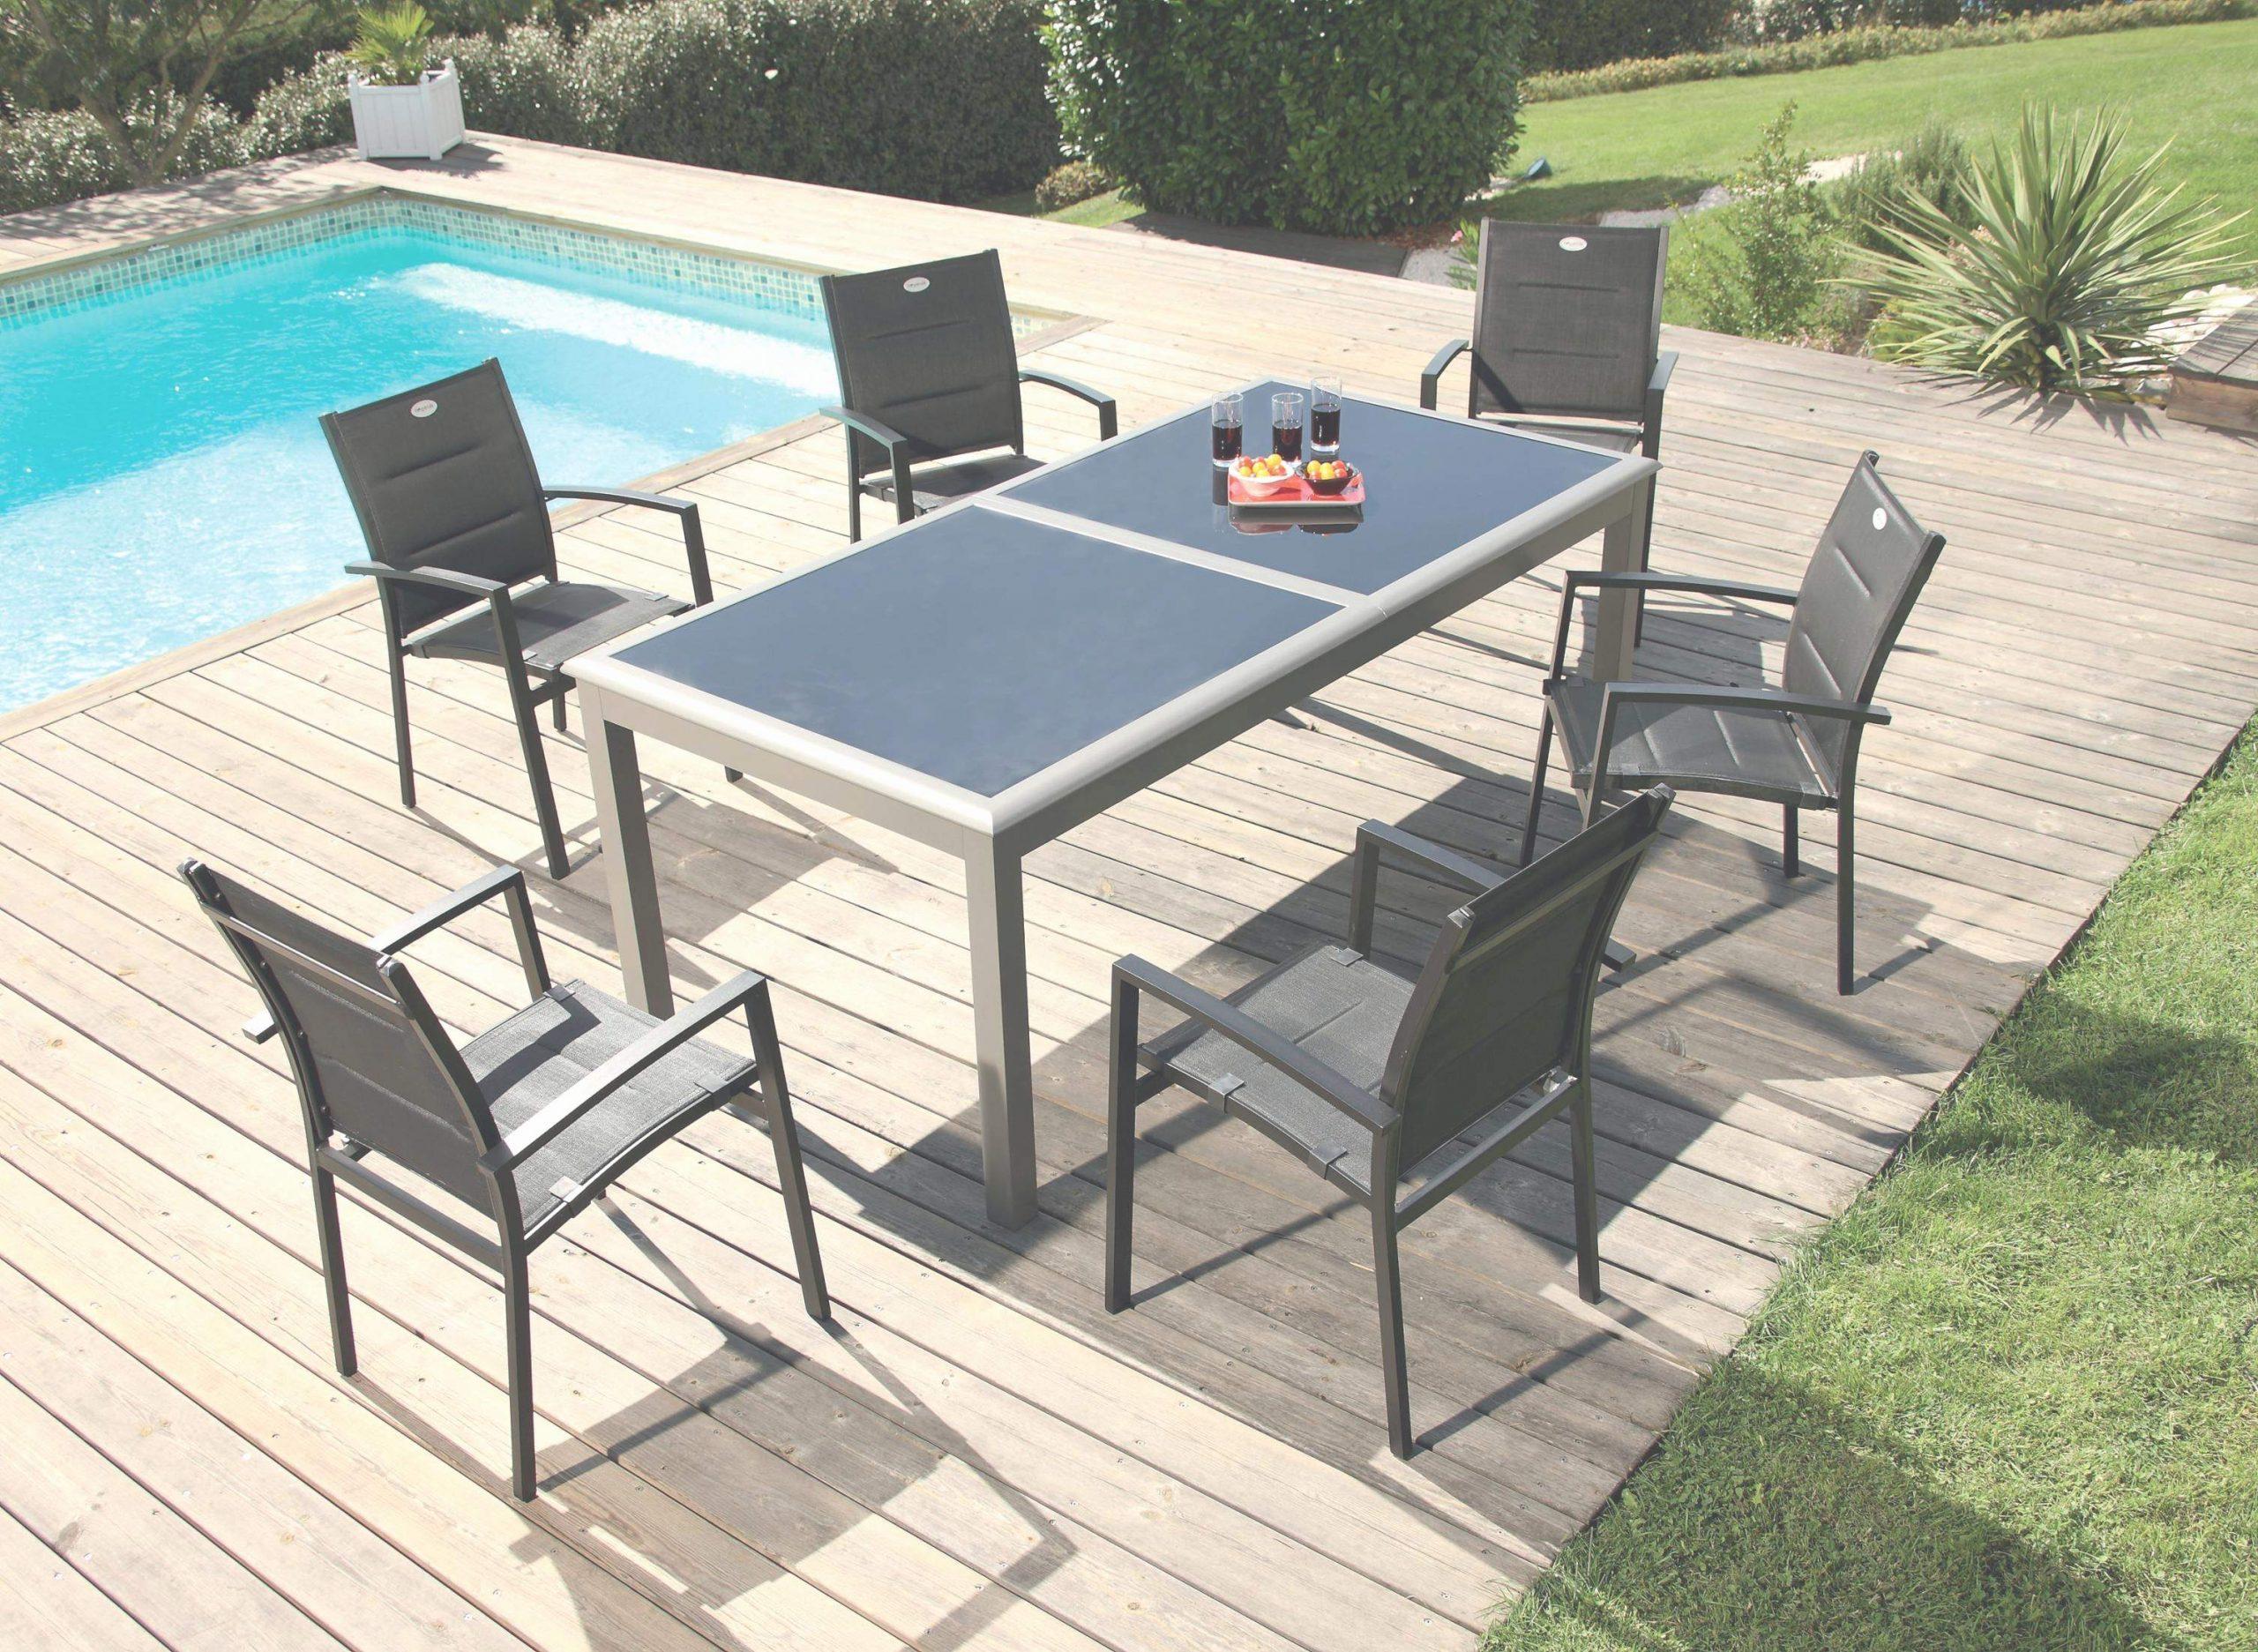 Chaise Centrakor De Jardin Home Brillant Table Pliante ... pour Salon De Jardin Centrakor